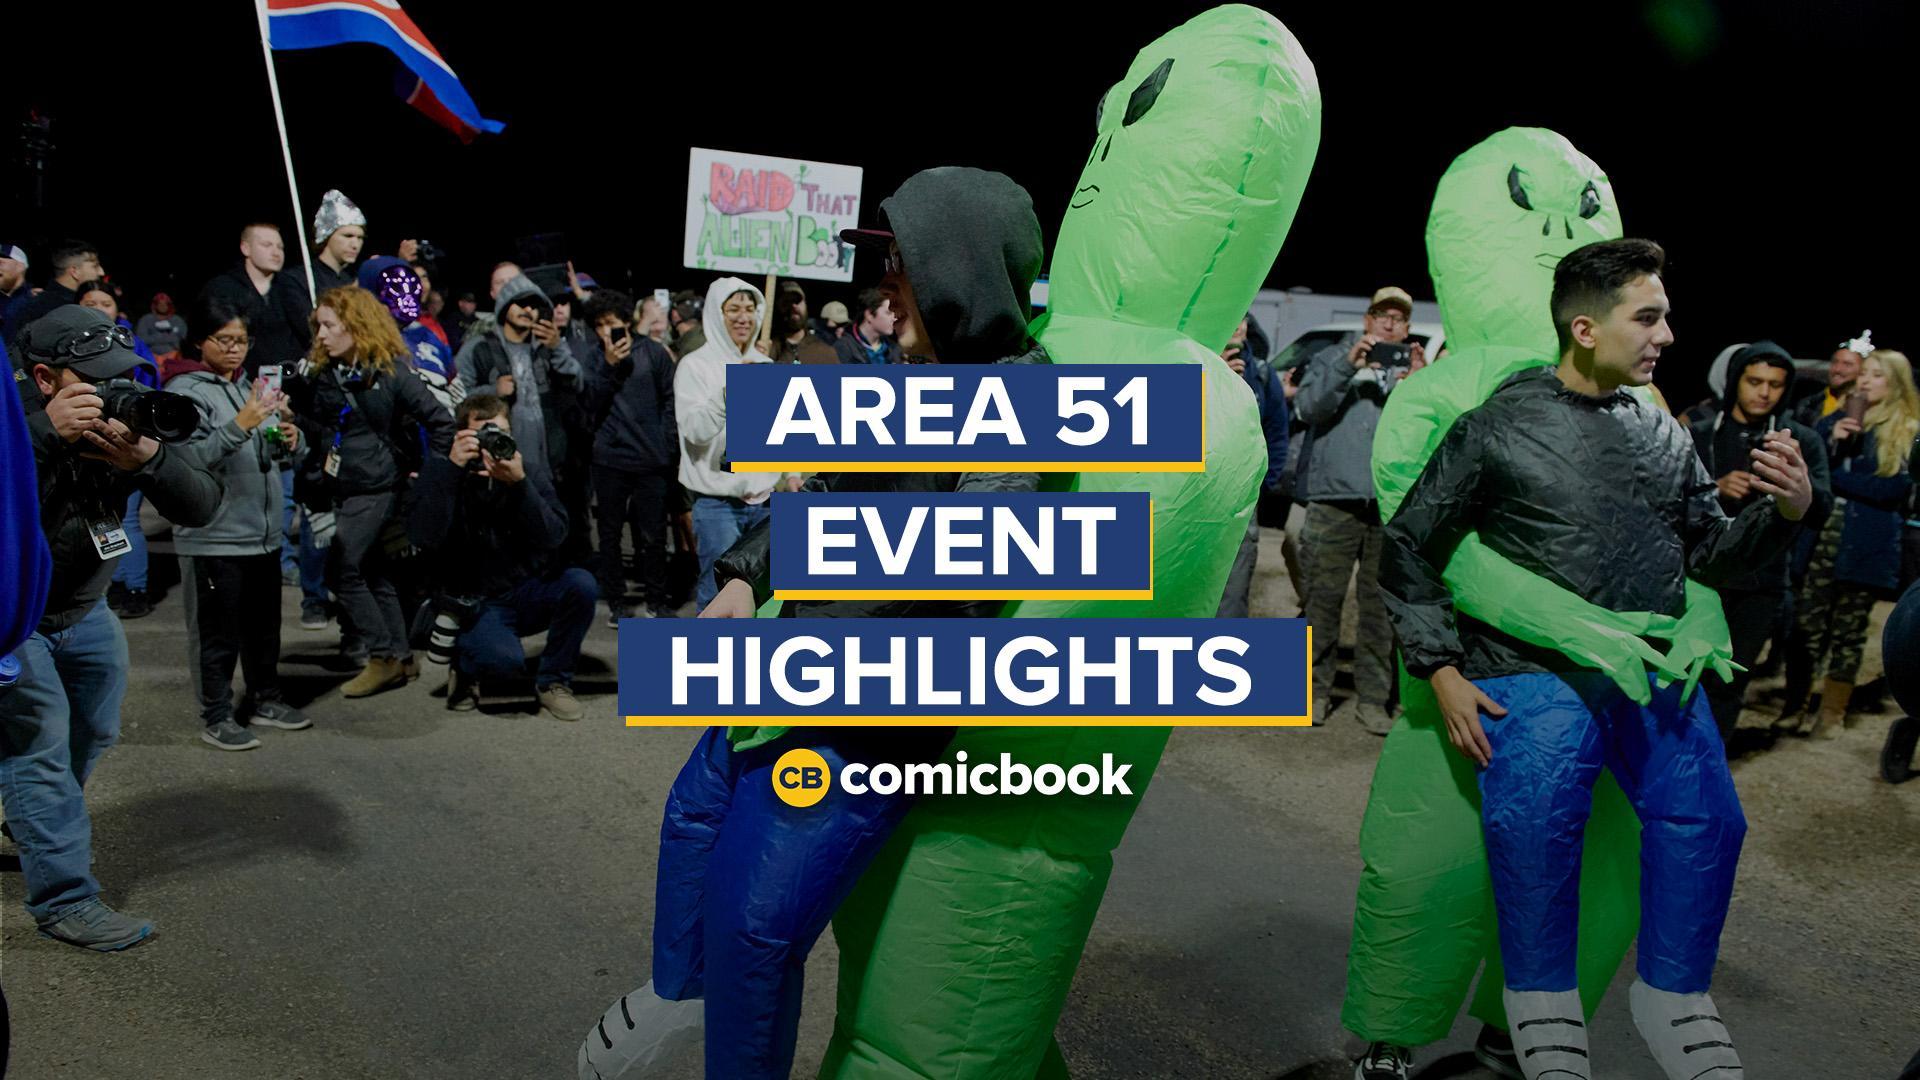 Area 51 Raid Highlights screen capture